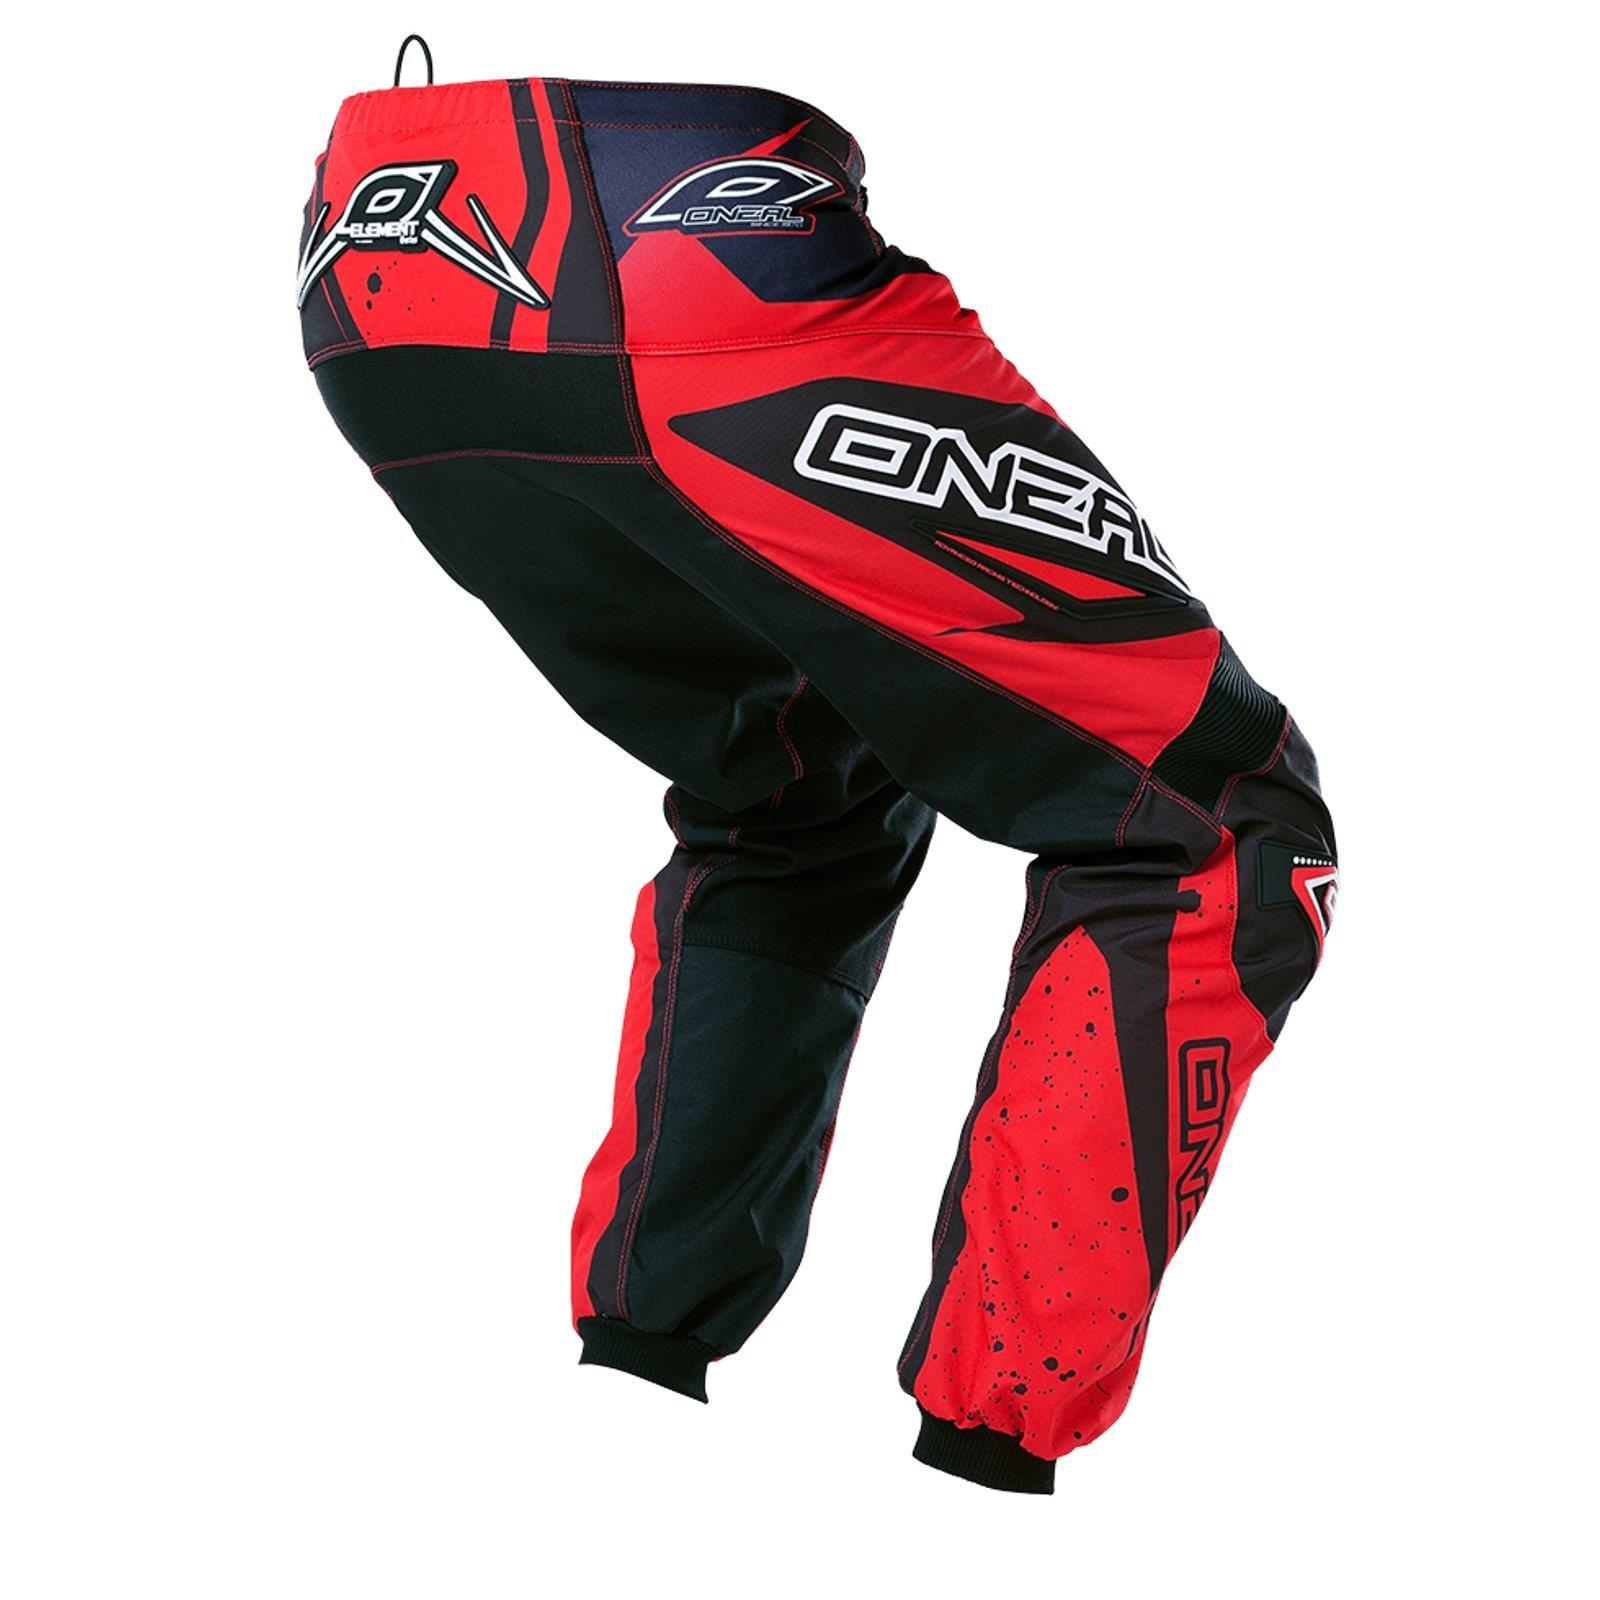 O-039-Neal-Element-MX-Pantaloni-Racewear-Pant-moto-cross-SX-Enduro-Fuoristrada-Moto-Quad miniatura 7